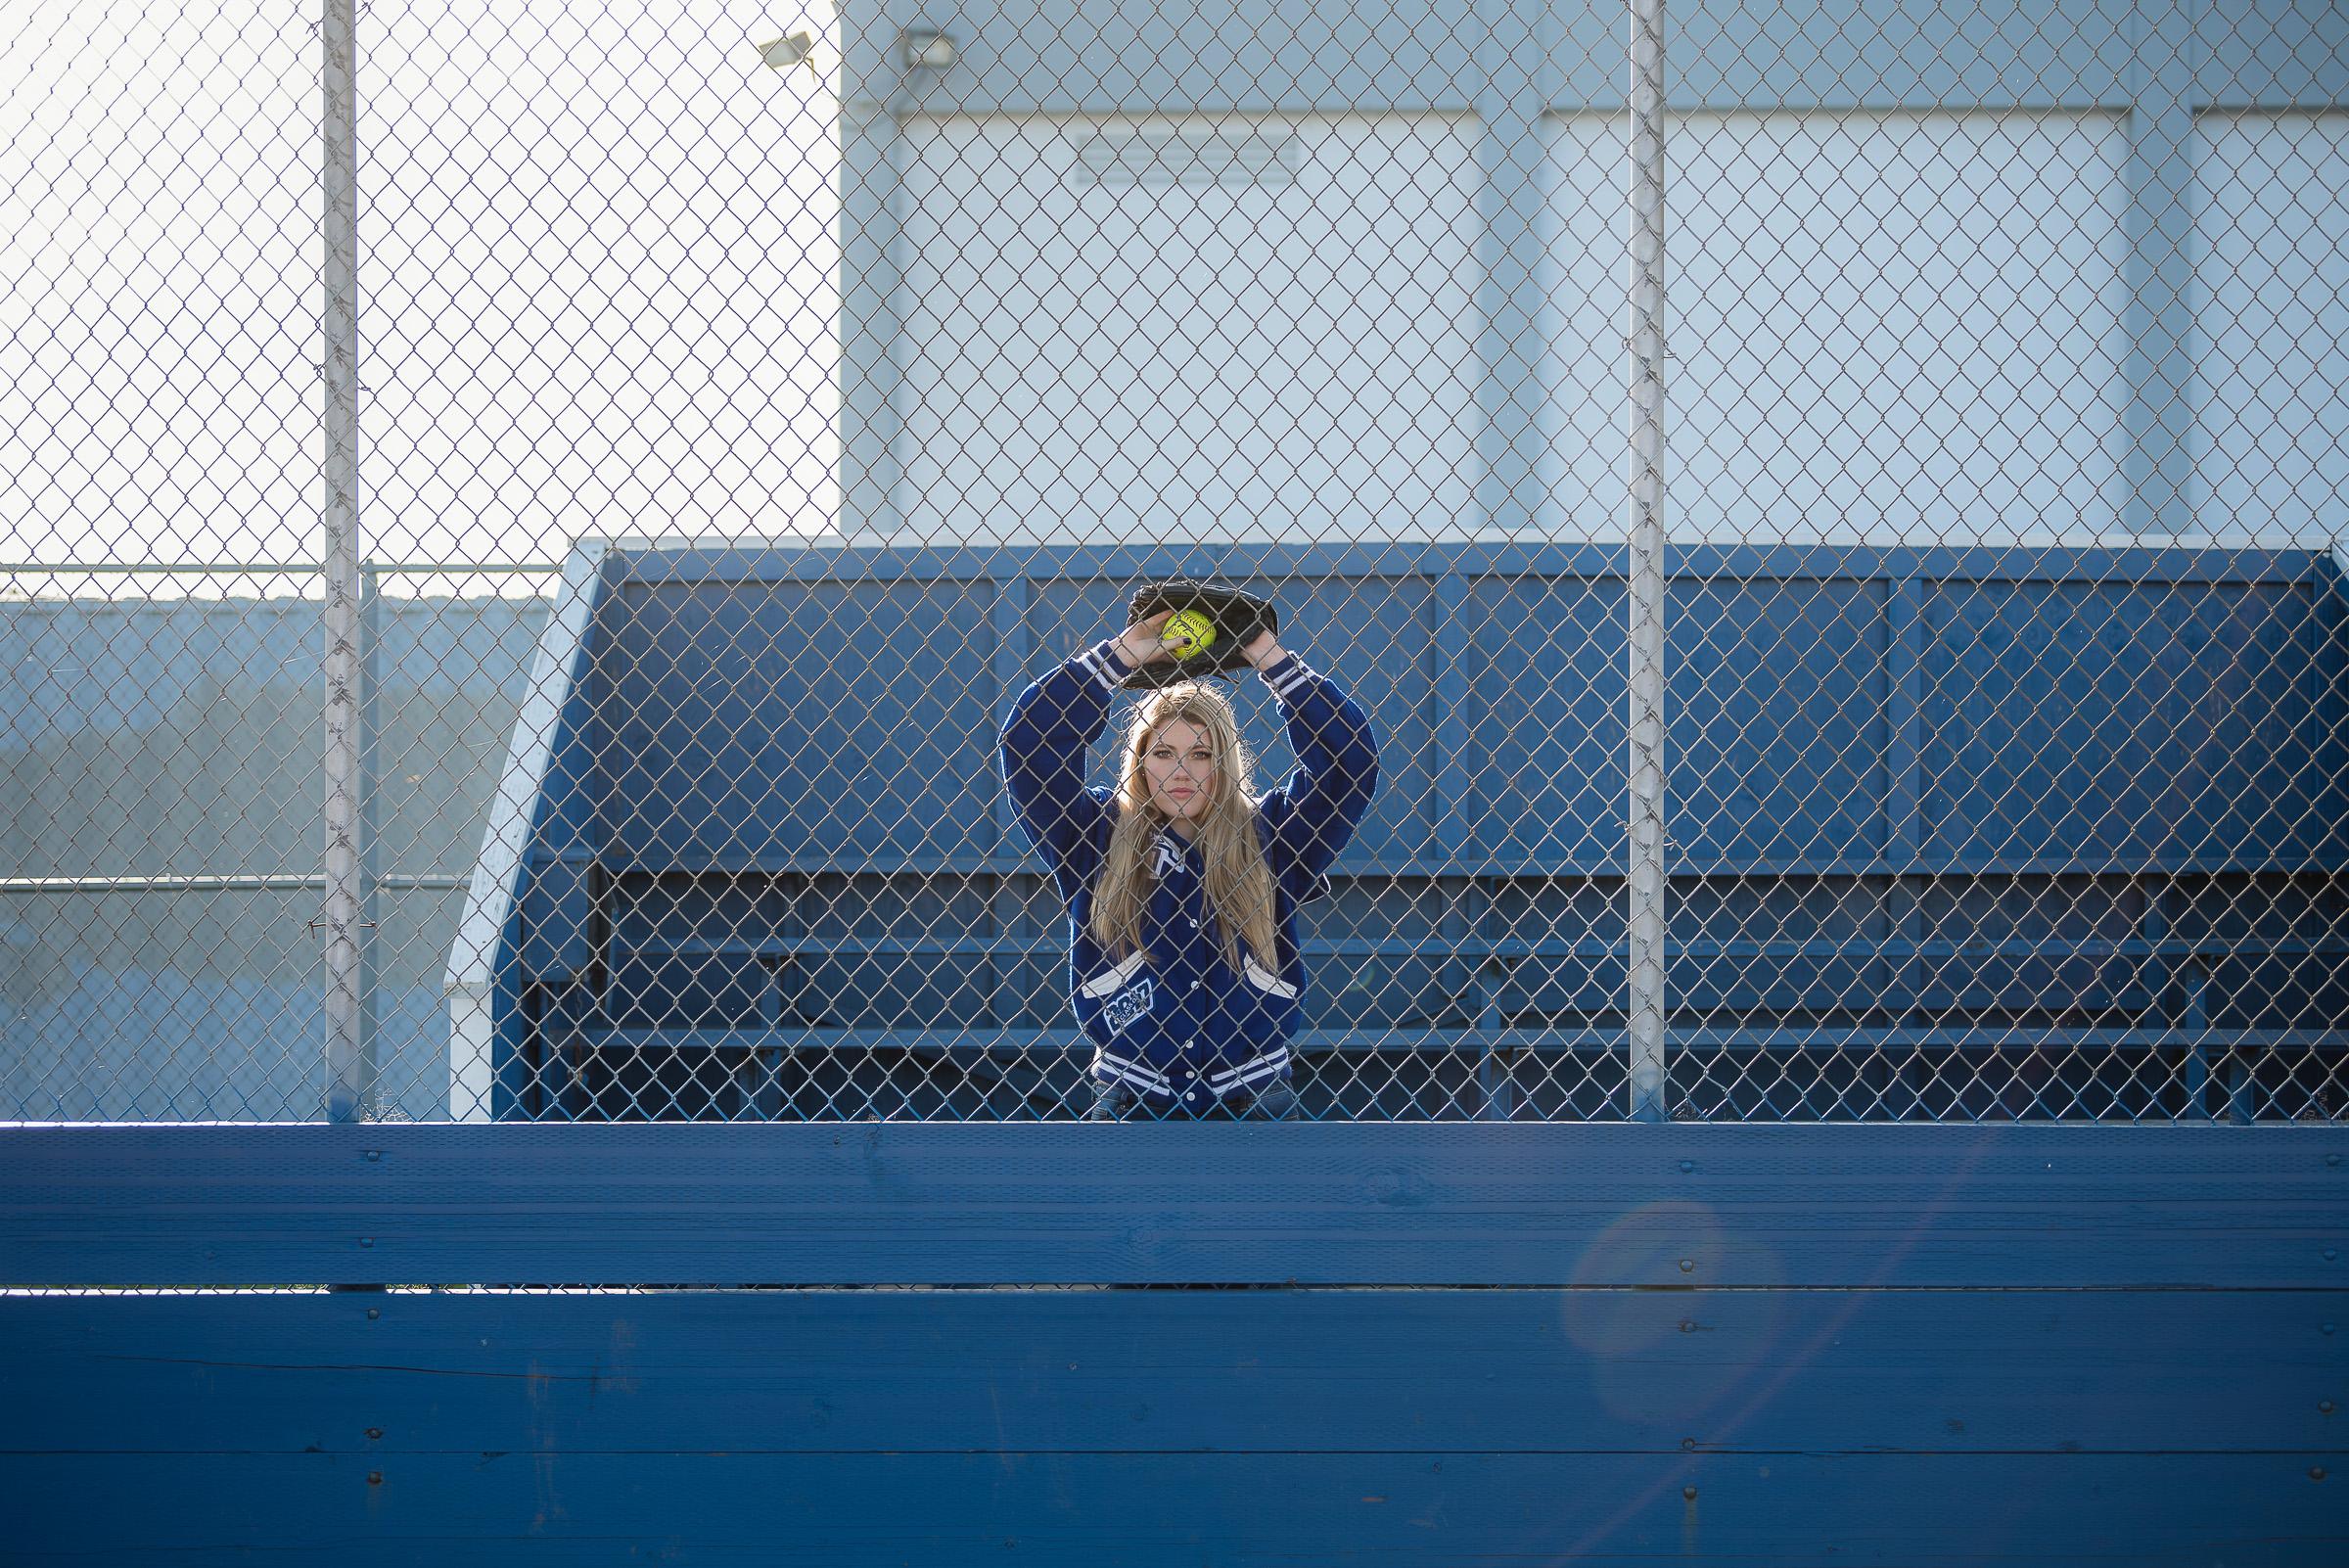 HumboldtCountySeniorPhotographer-Shelby-FortunaHigh-Softball-5.JPG